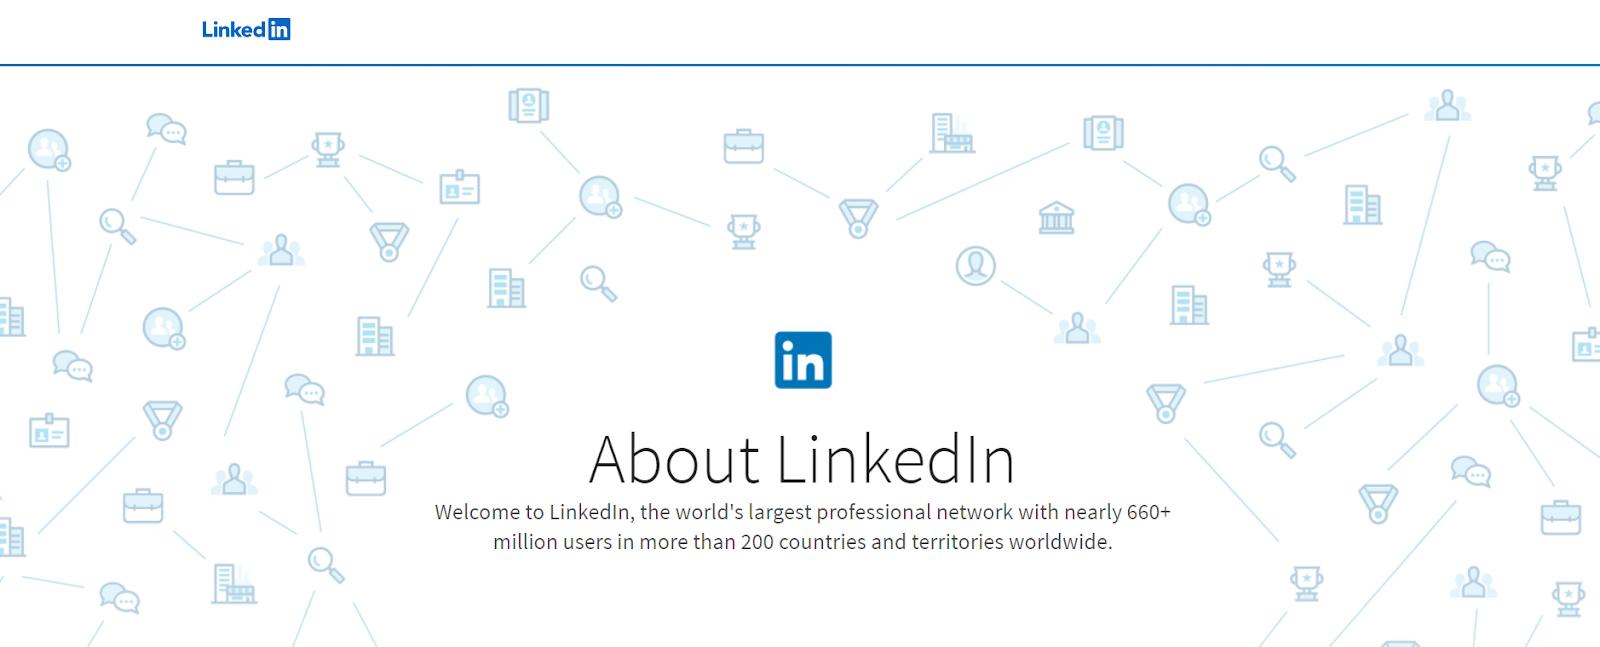 screenshot of LinkedIn website